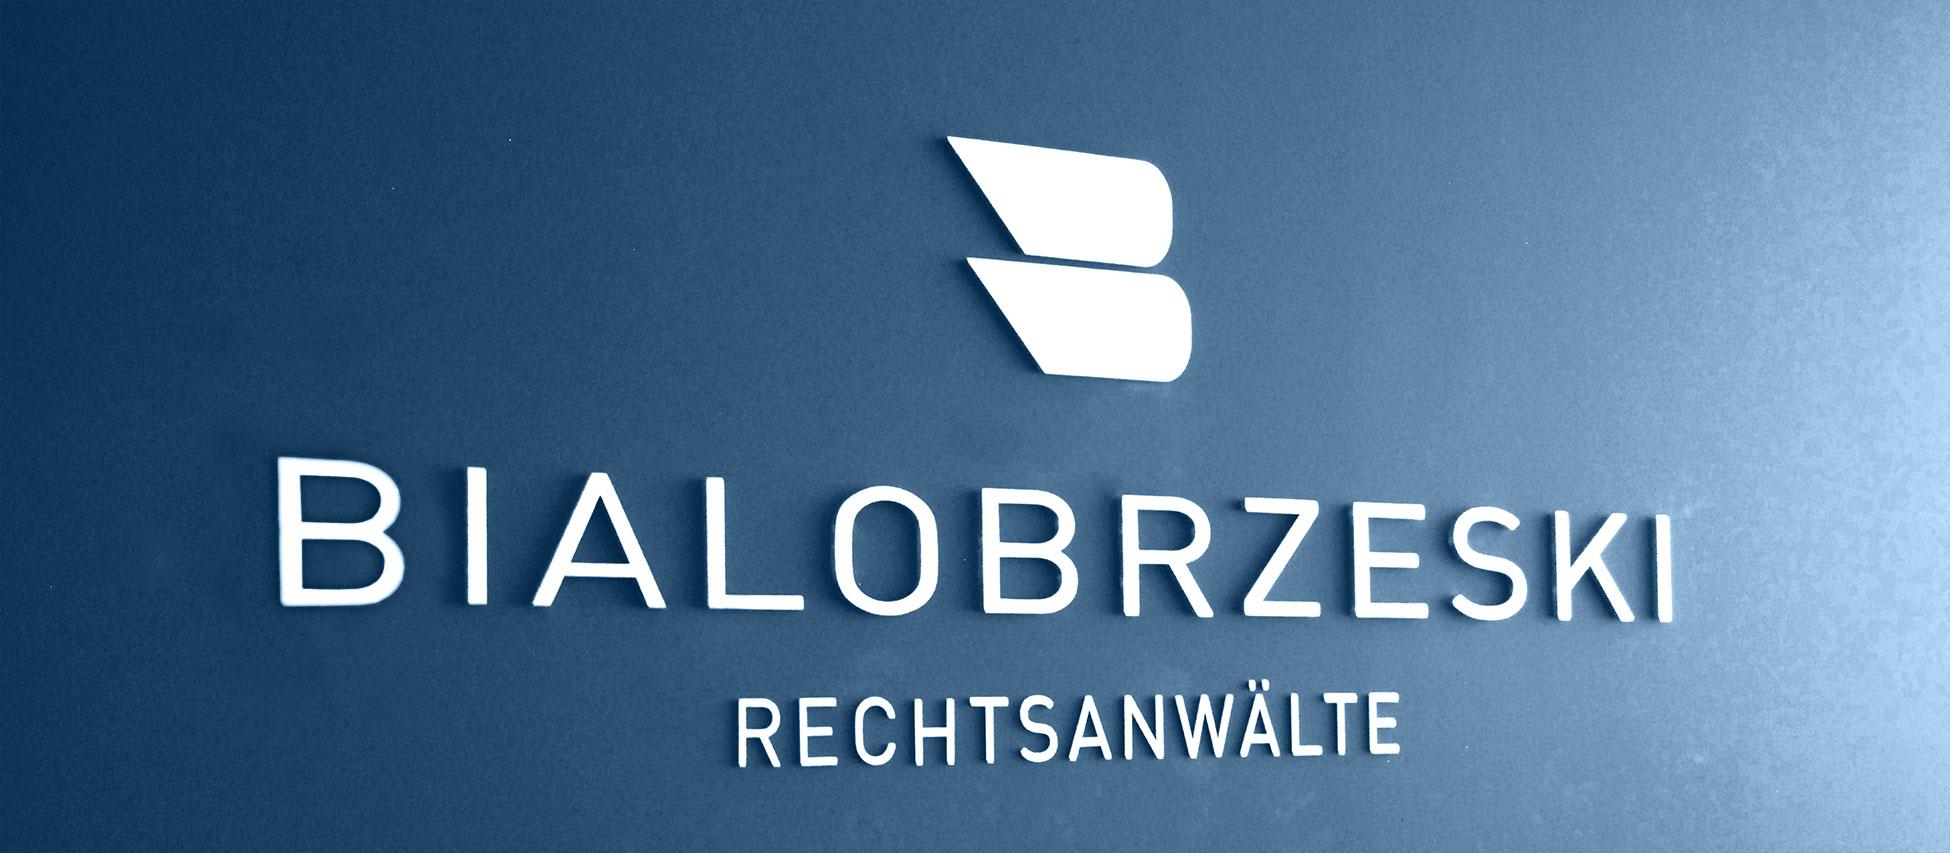 Rechtsanwalt Bialobrzeski Header